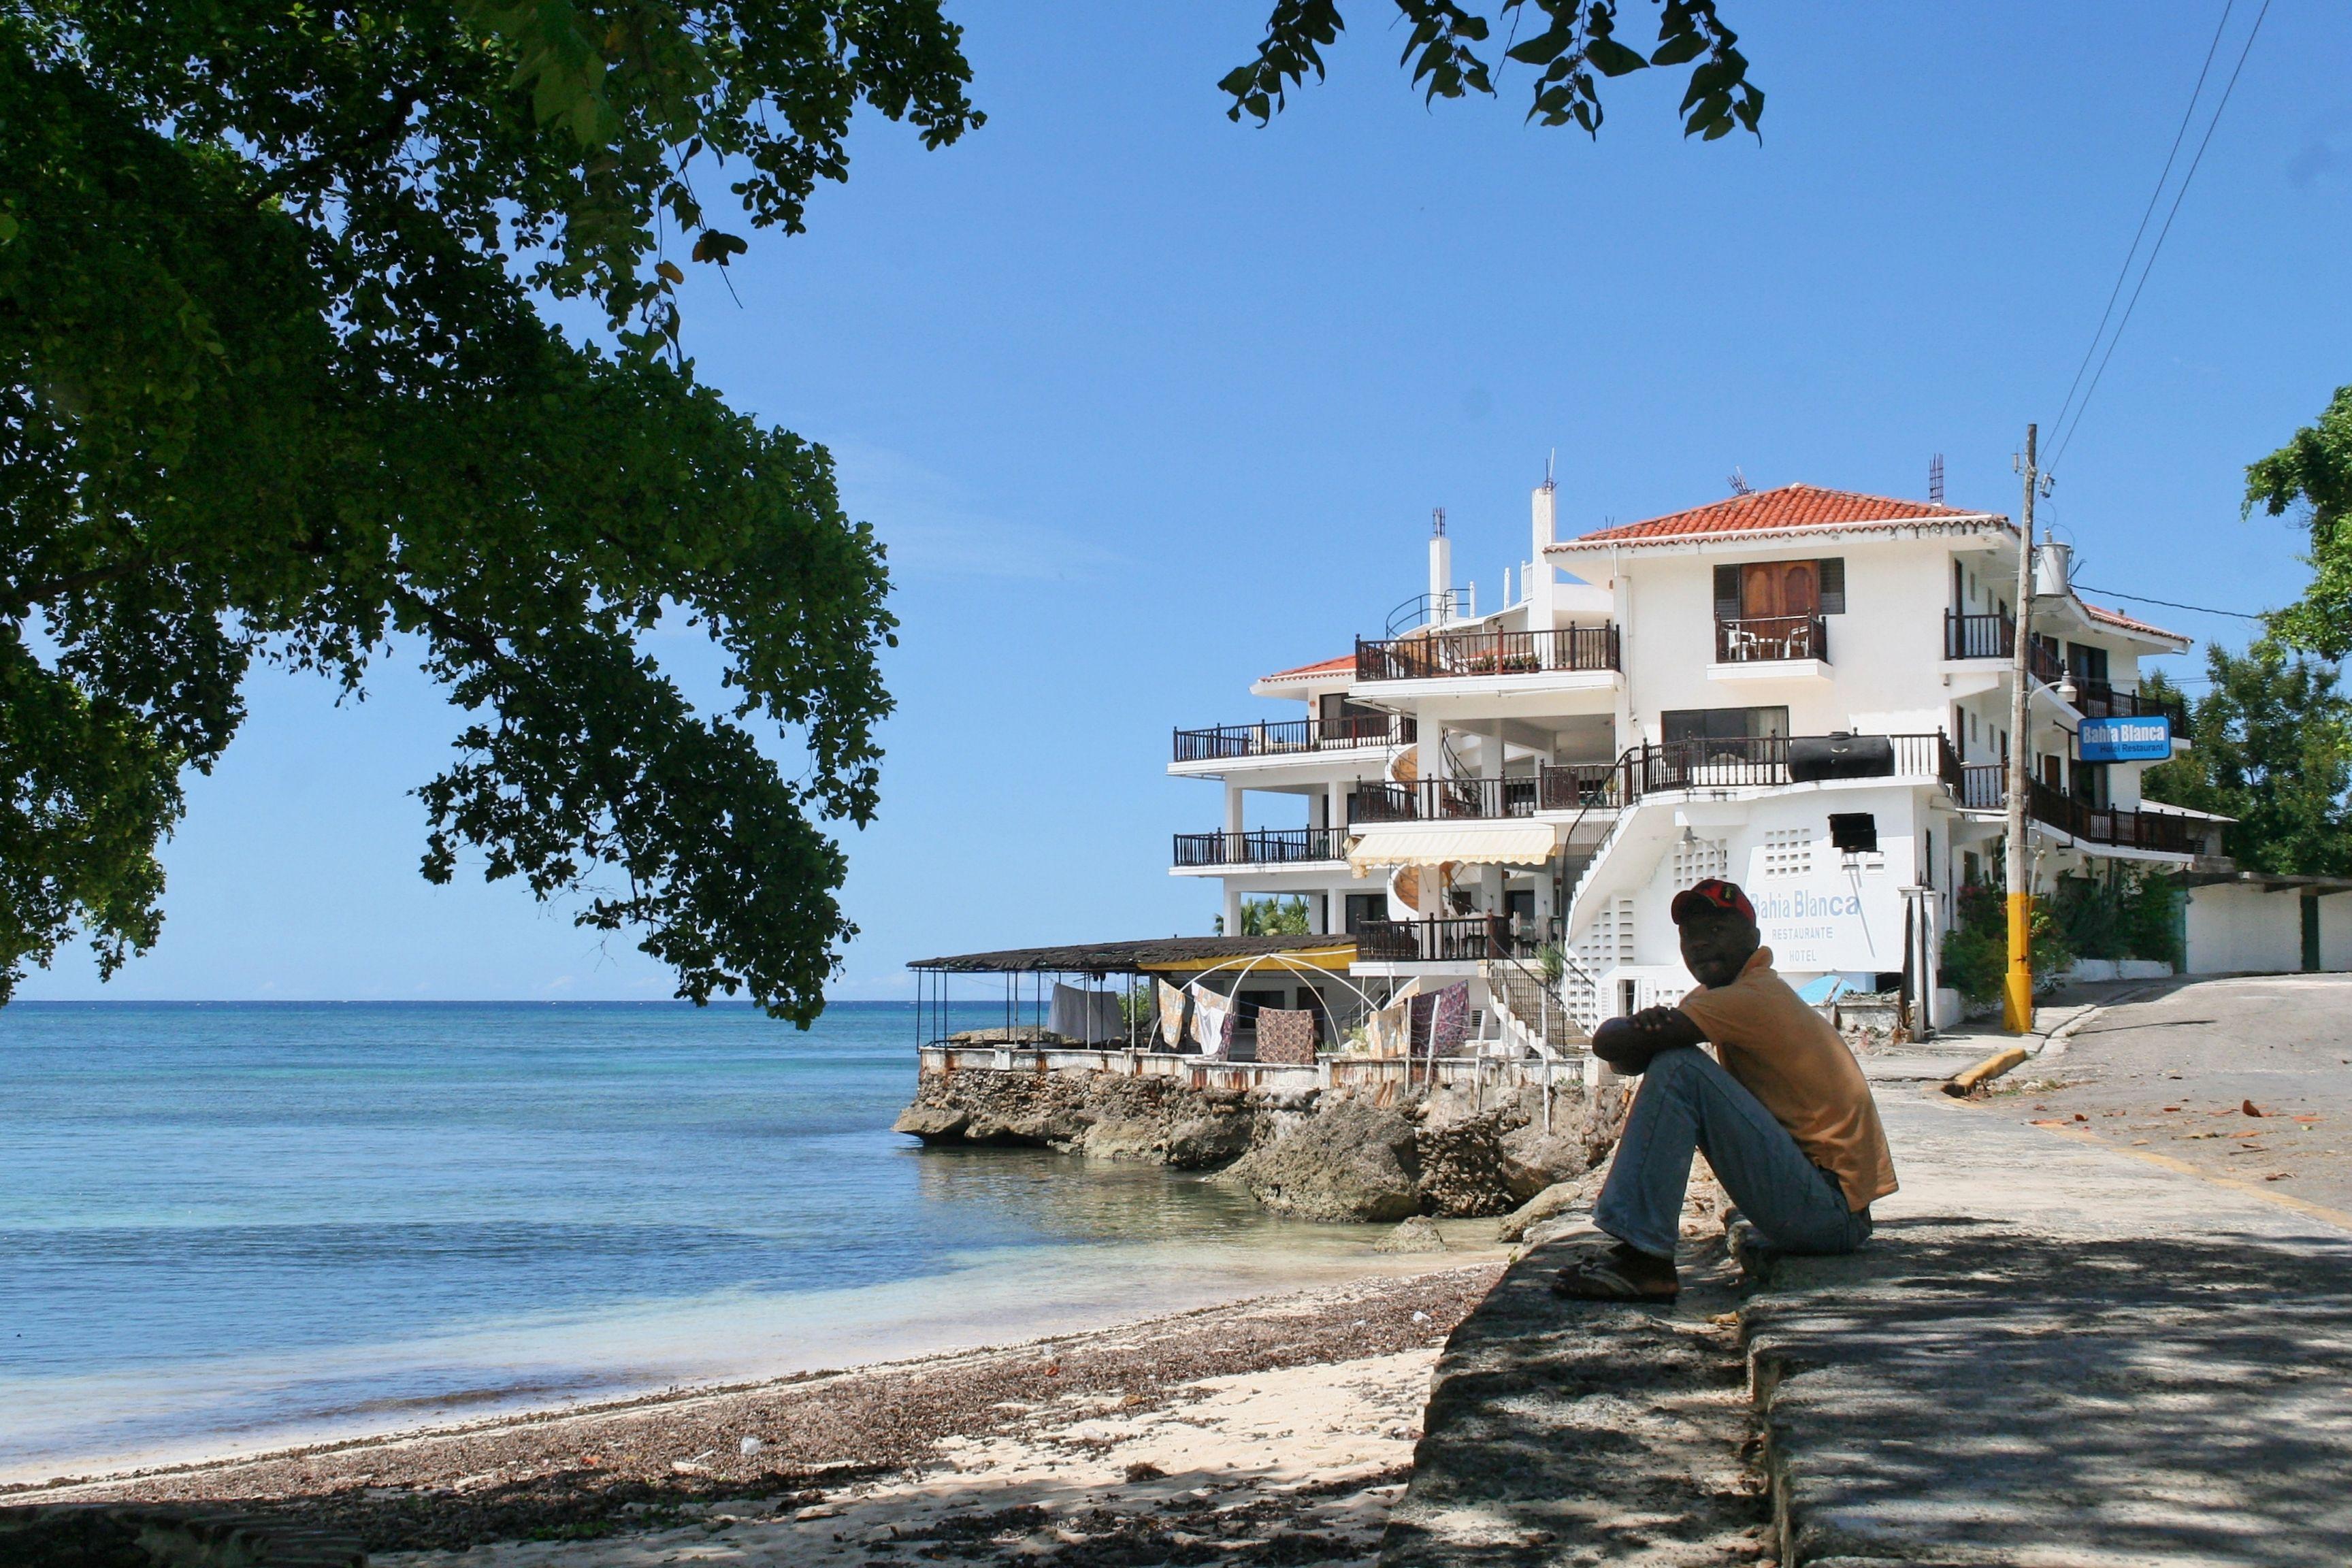 Rio San Juan Republica Dominicana Tropical Vibes Dominican Republic Strand